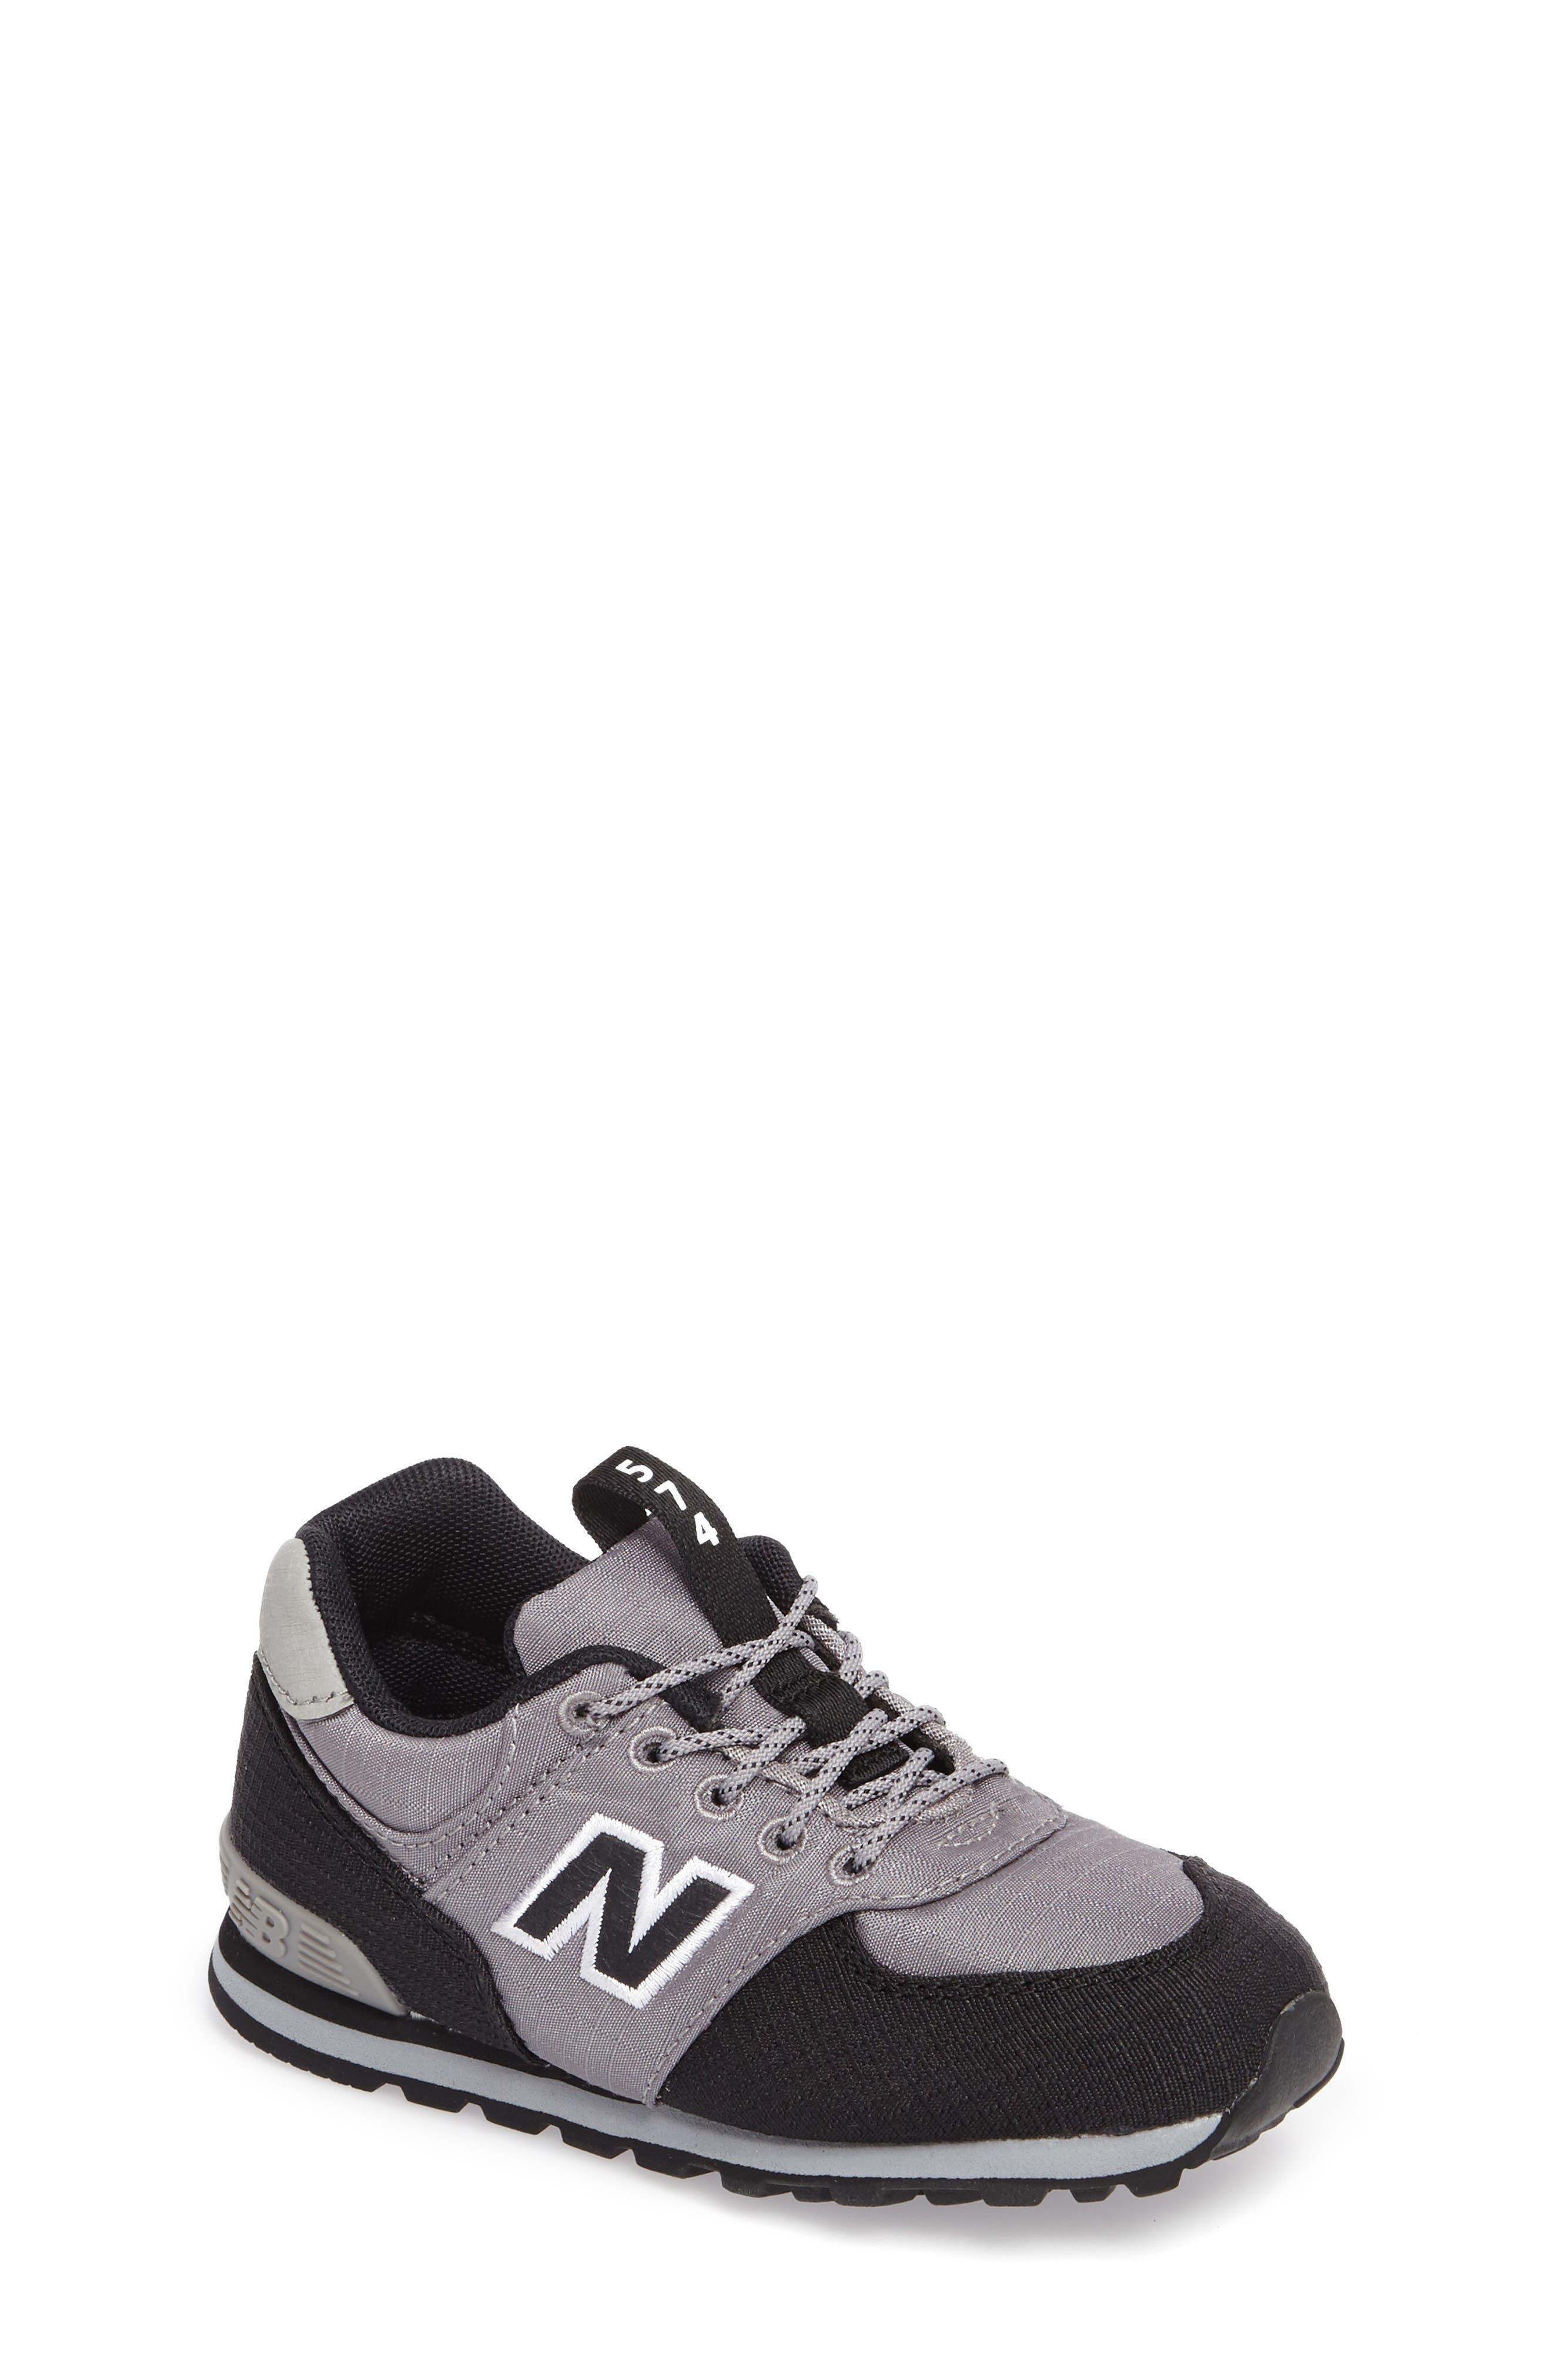 574 Sneaker,                             Main thumbnail 1, color,                             Grey